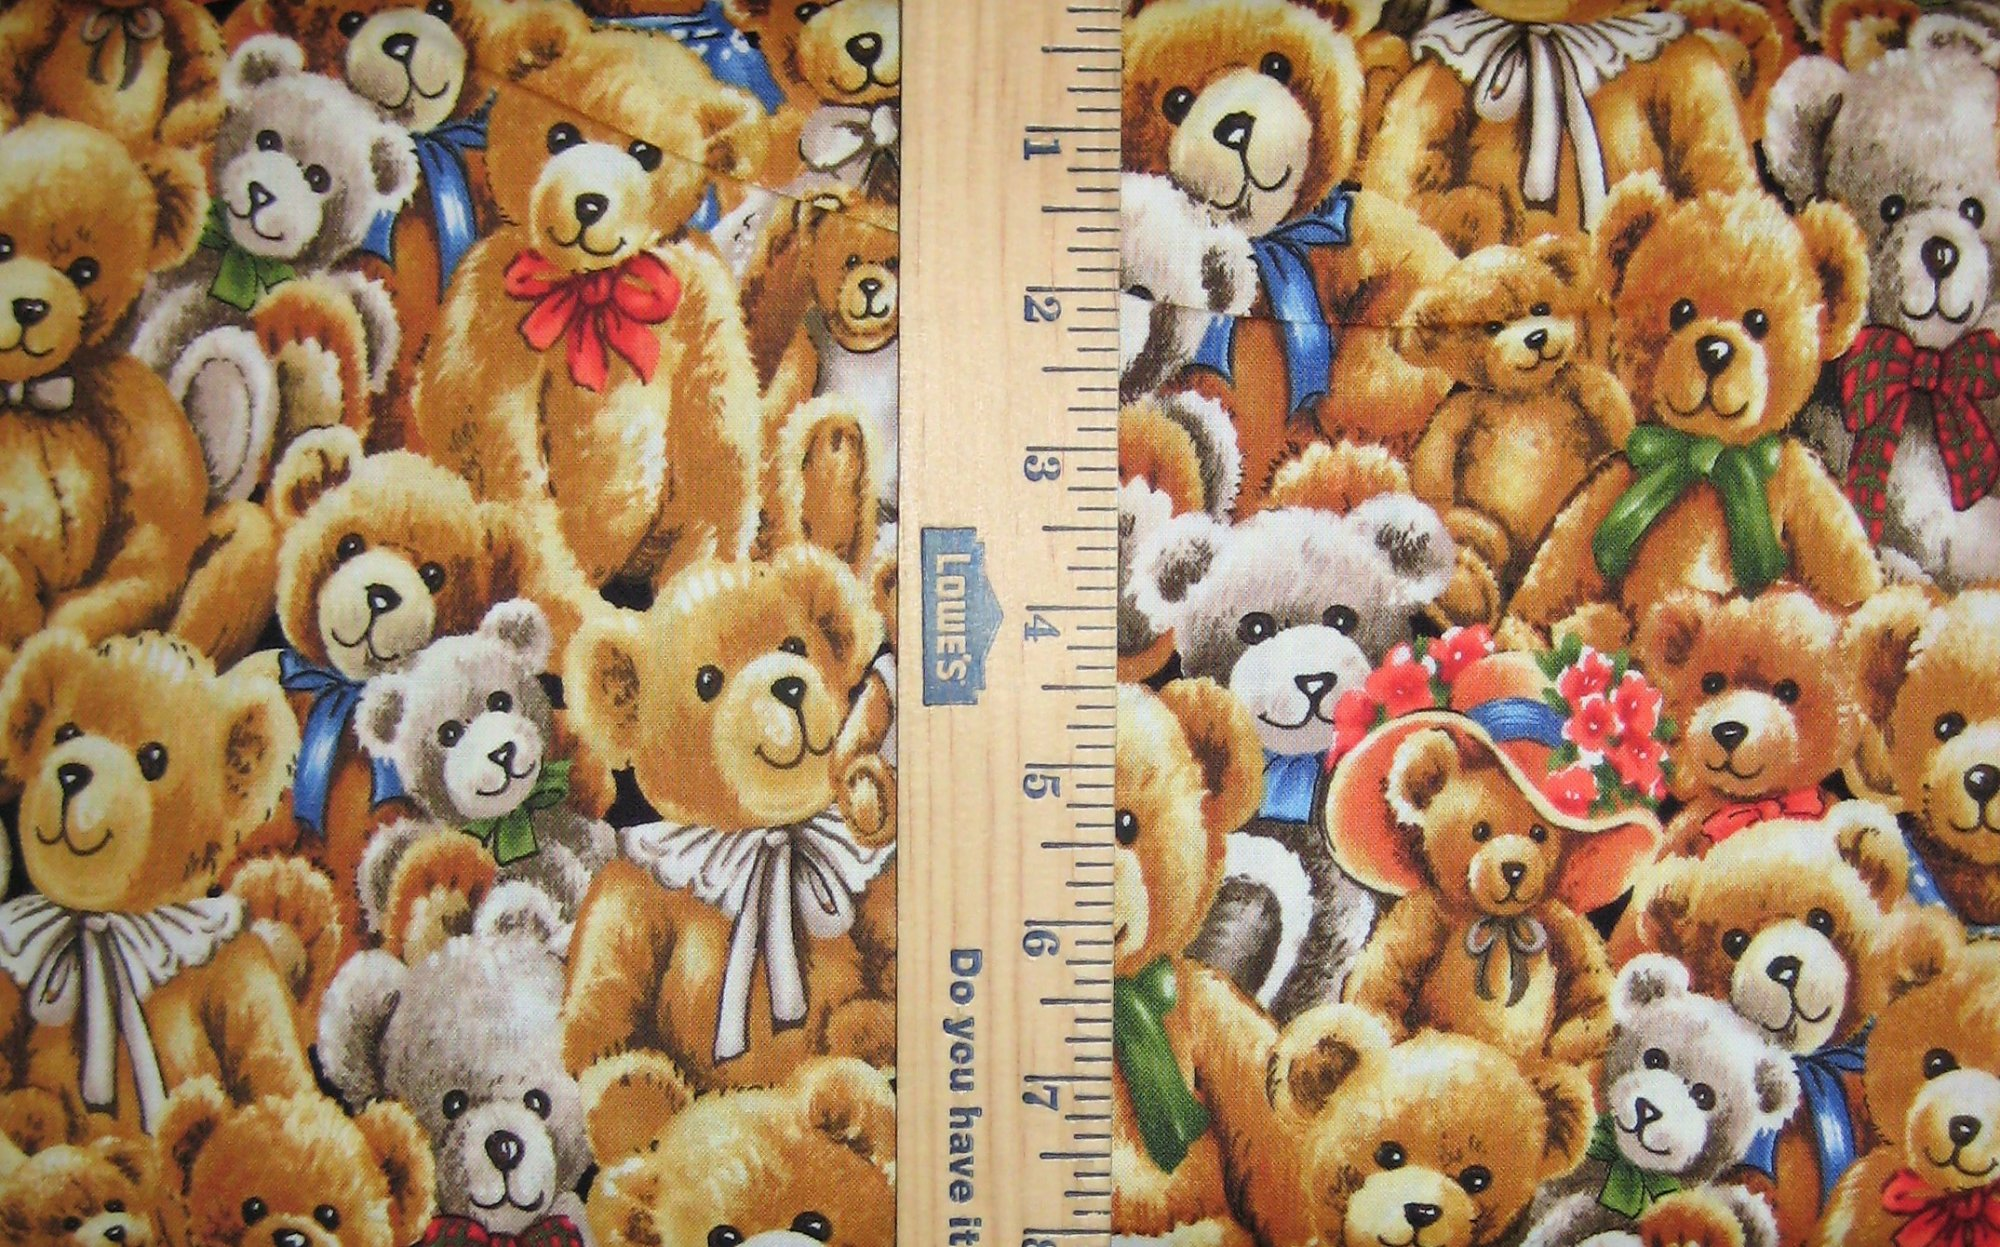 Teddy Bear Hugs 112-29401 Packed